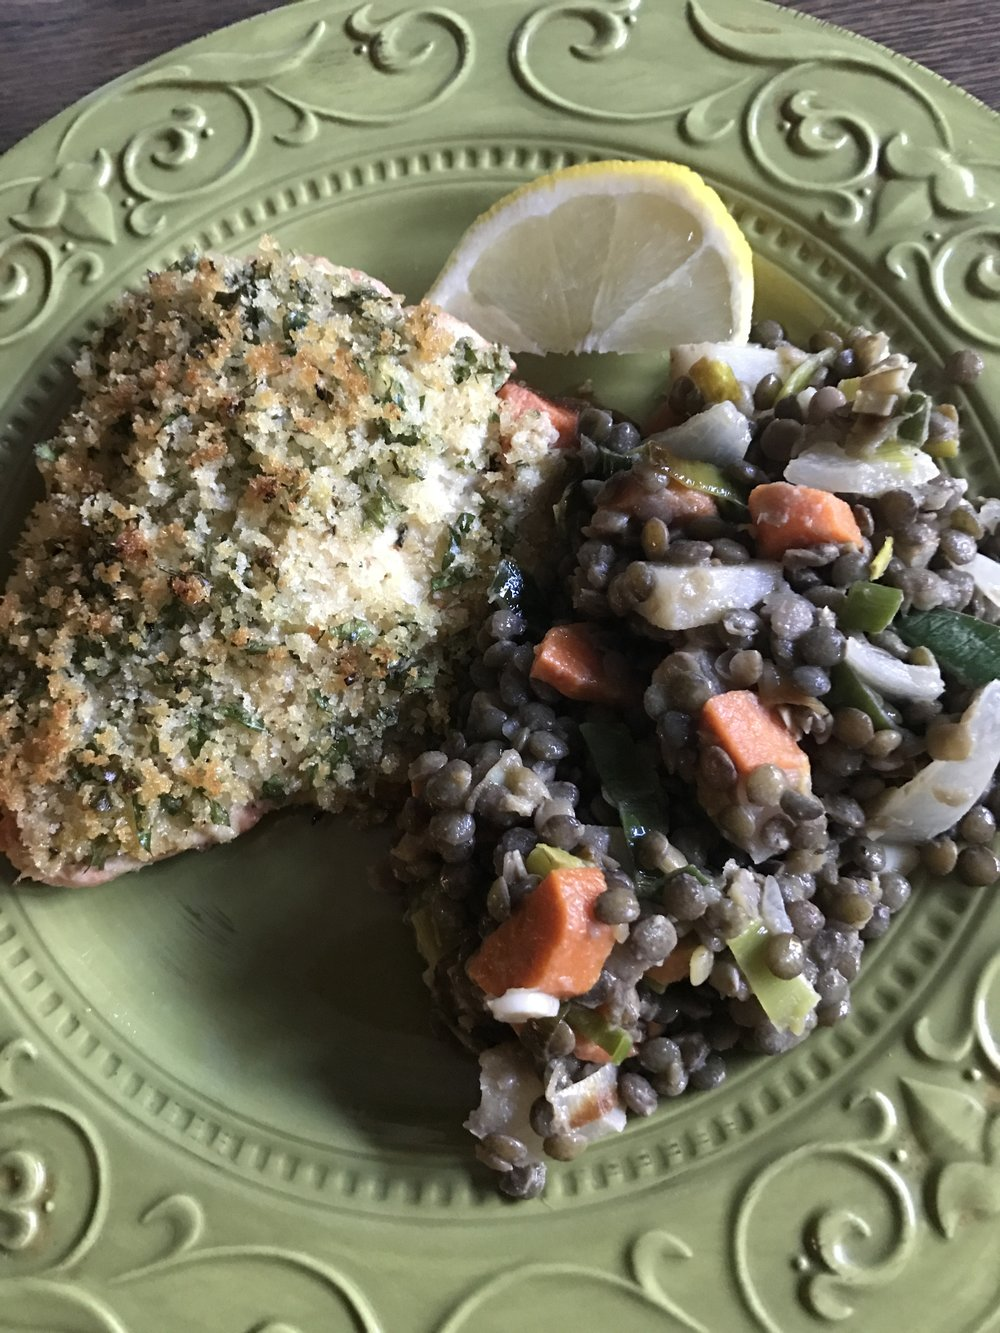 panko-crusted-salmon-warm-lentil-salad.JPG